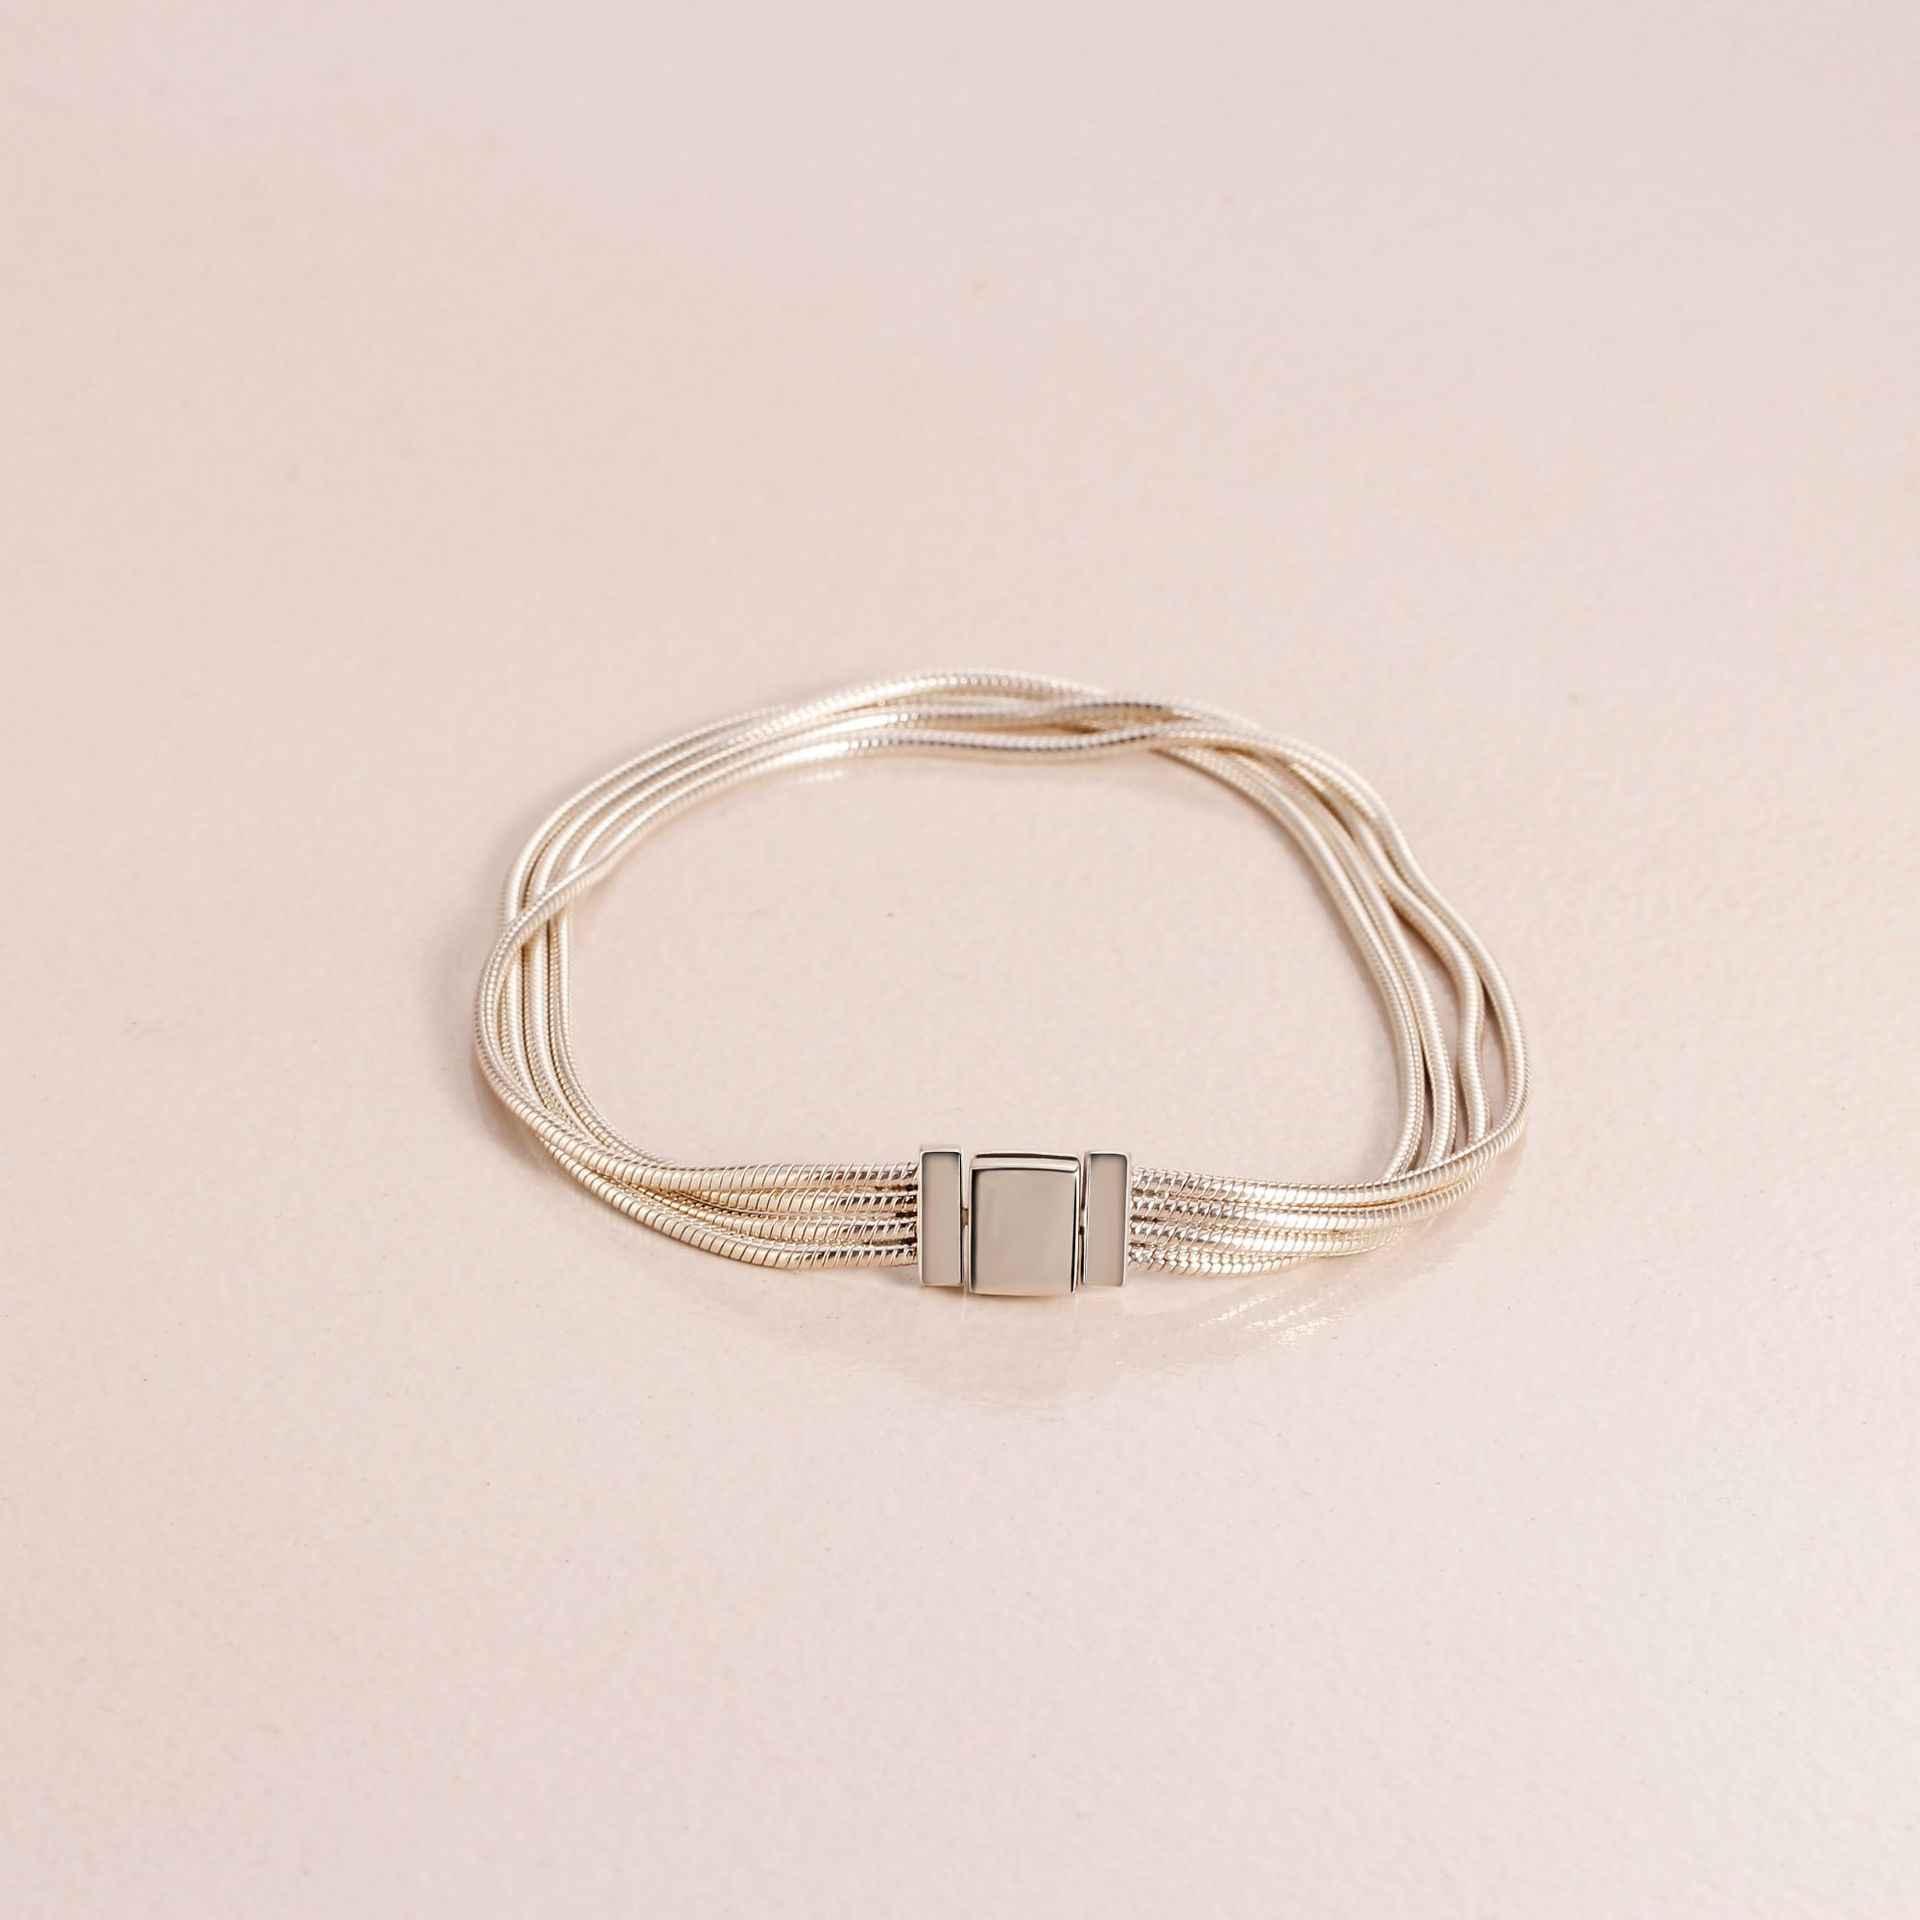 Echtes 925 Sterling Silber Armband Reflexions Multi Schlange Kette Armband Armreif Fit Frauen Perle Charme Diy Mode Schmuck